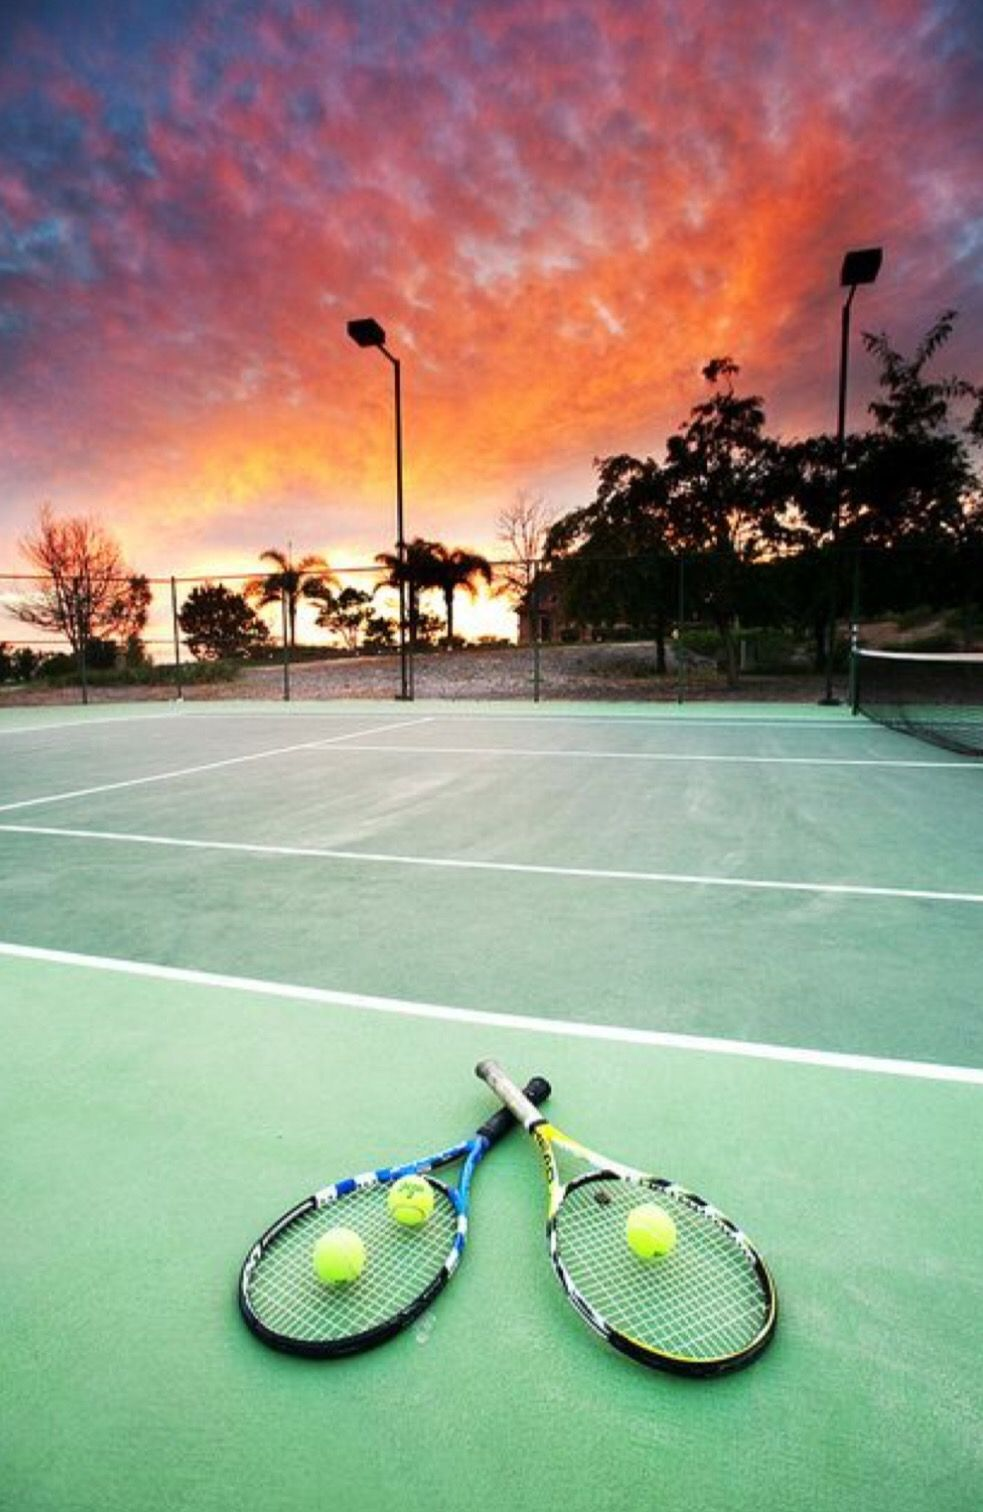 Tennis california Tennis, Tennis photography, Tennis life